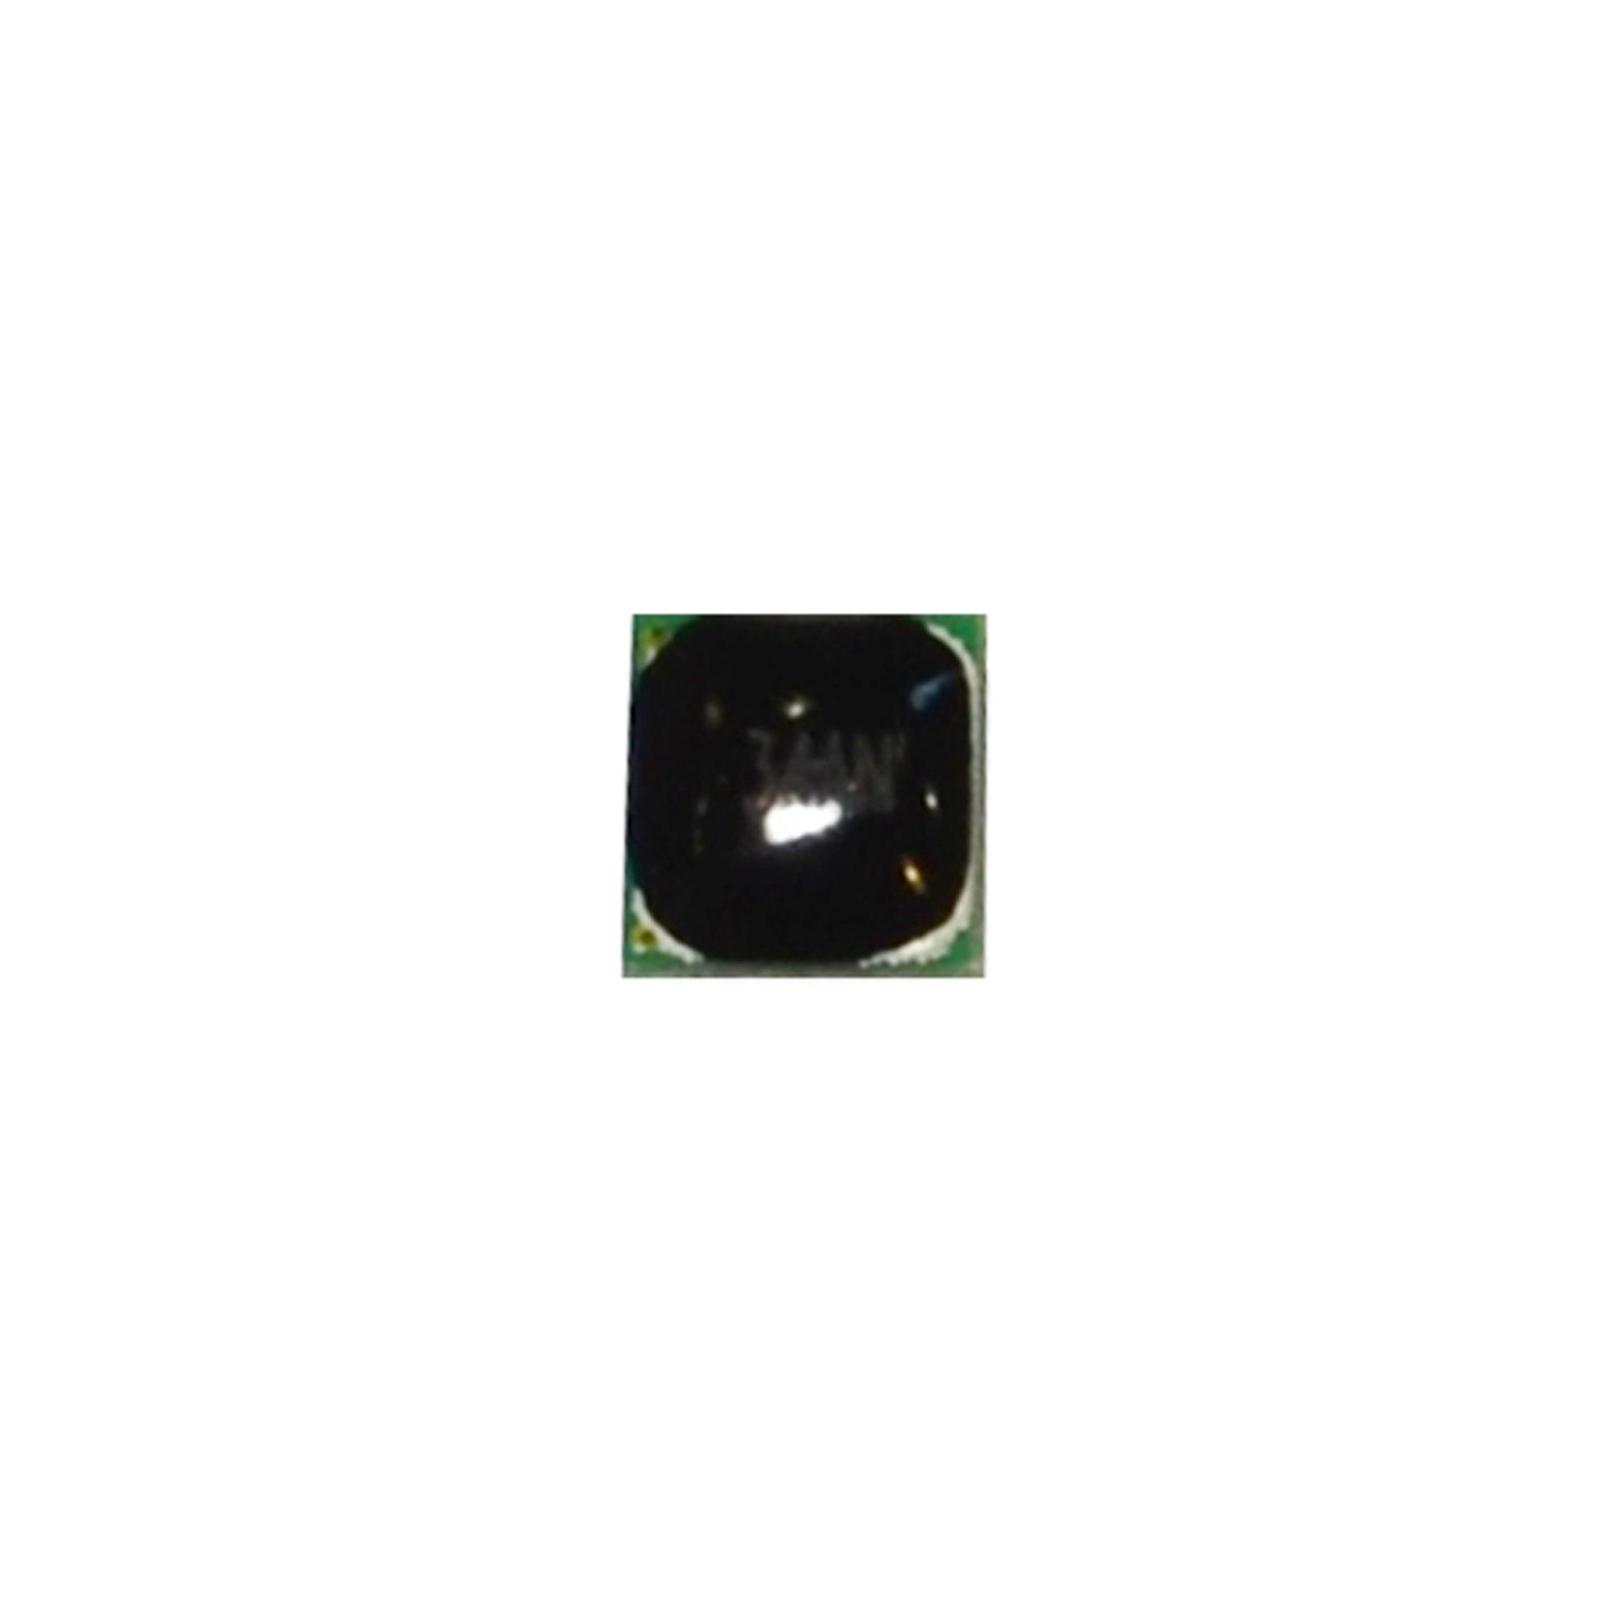 Чип для картриджа фотобарабана HP LJ Pro M102 (CF219A) 12k Static Control (HM102DUCP) изображение 2